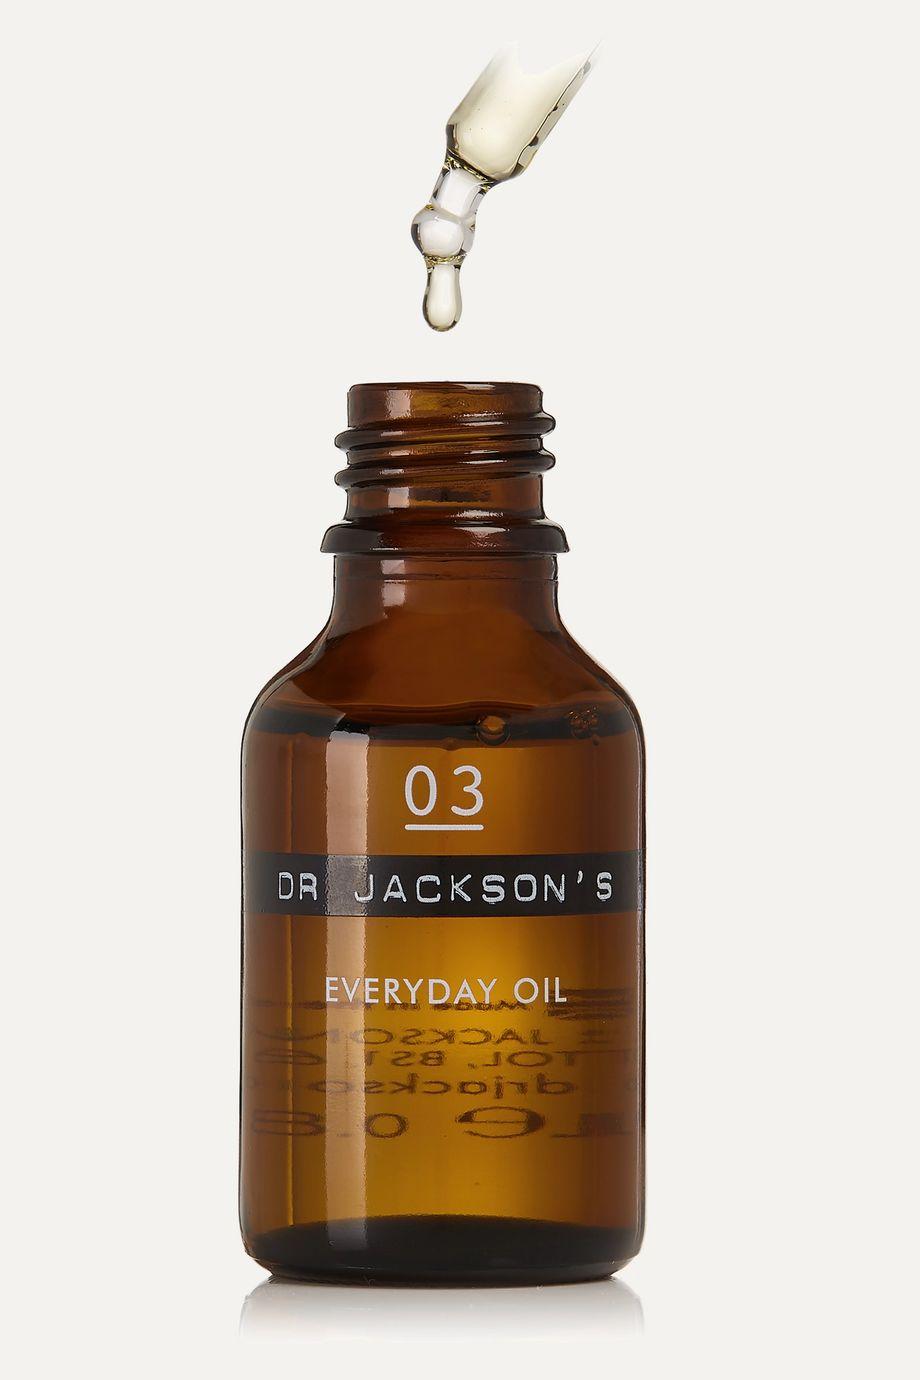 Dr. Jackson's Everyday Oil 03, 25ml